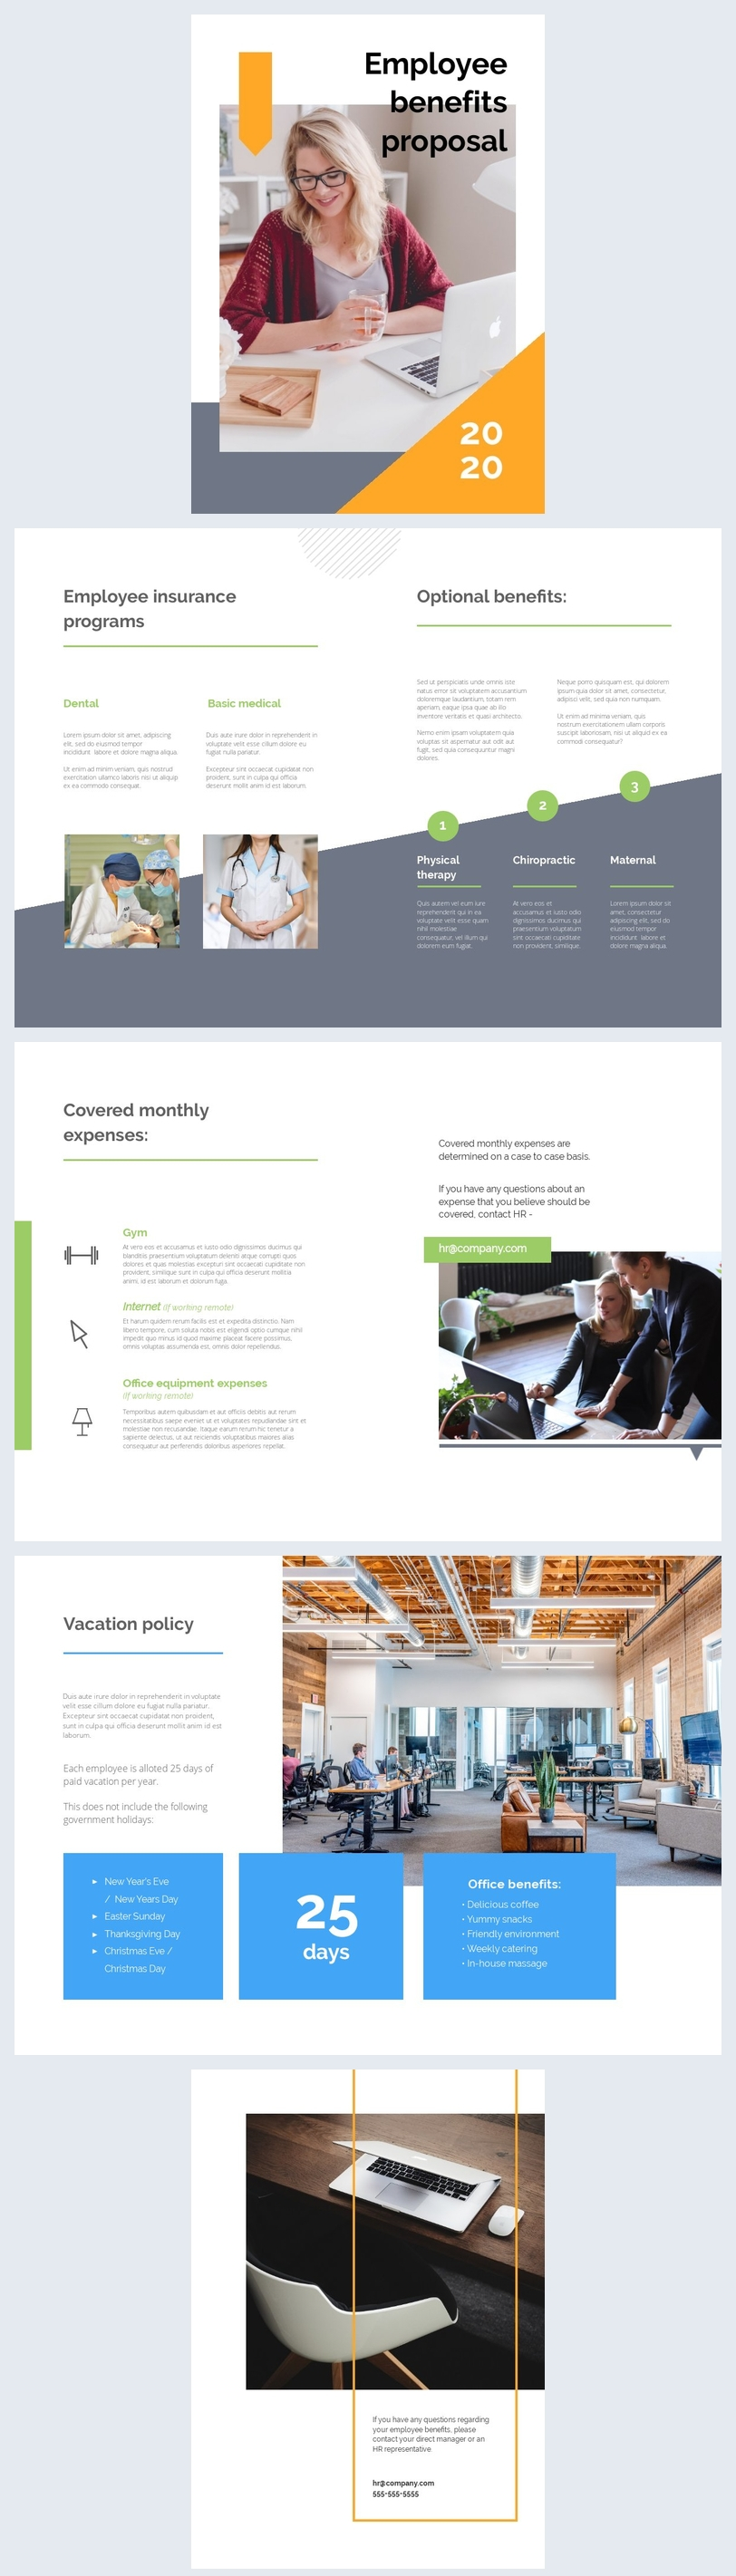 Layout de Design de Proposta de Benefícios para Empregados